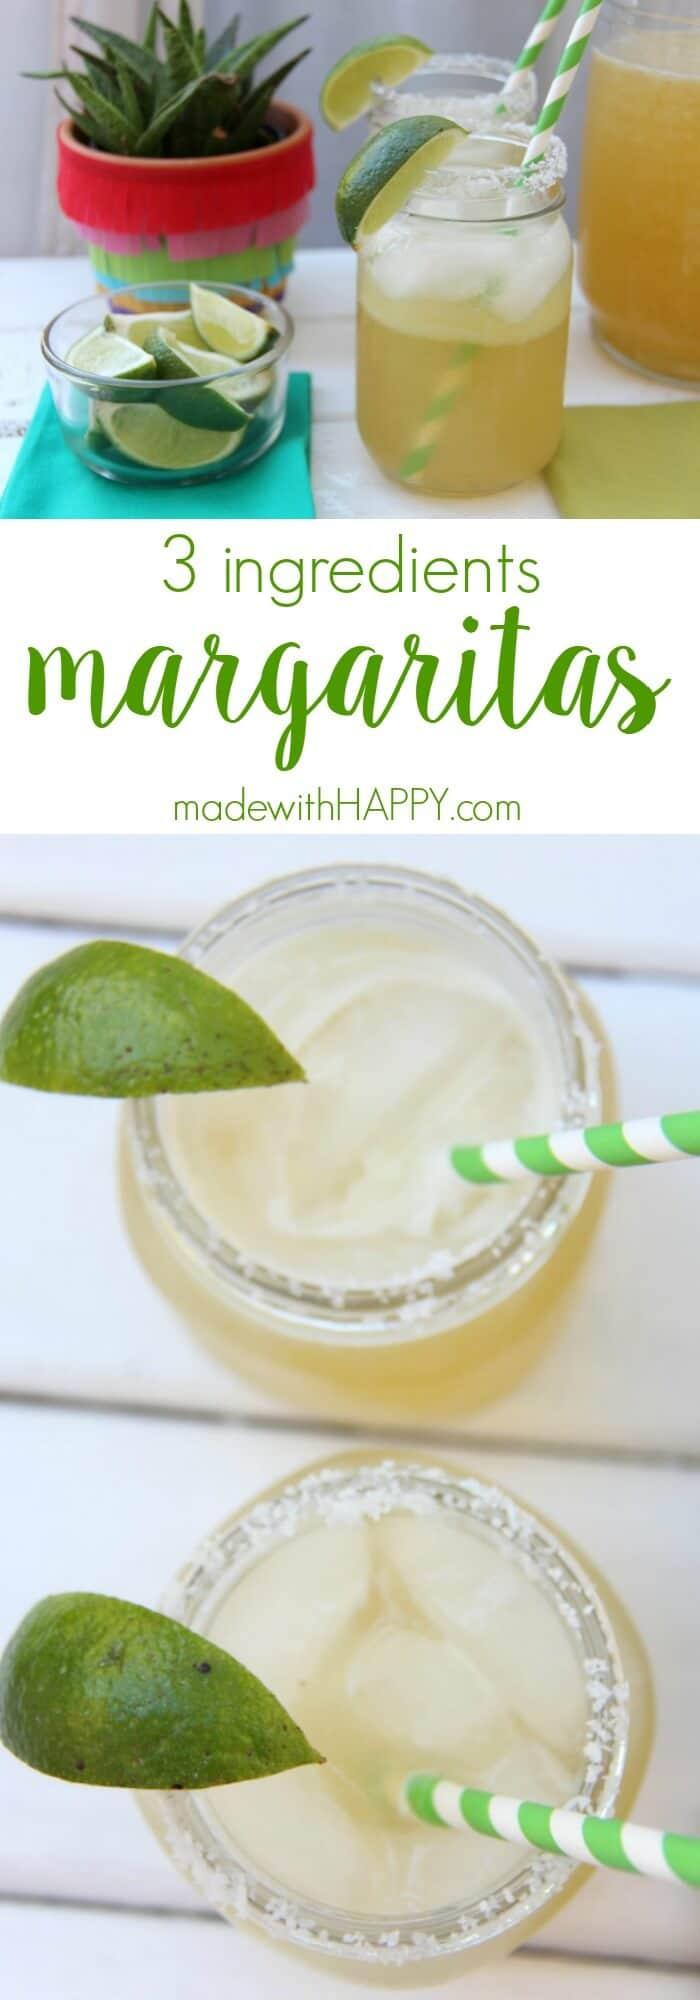 The best Margarita | 3 Ingredients margarita | The best beer margarita recipe | Margarita Cocktail | www.madewithhappy.com